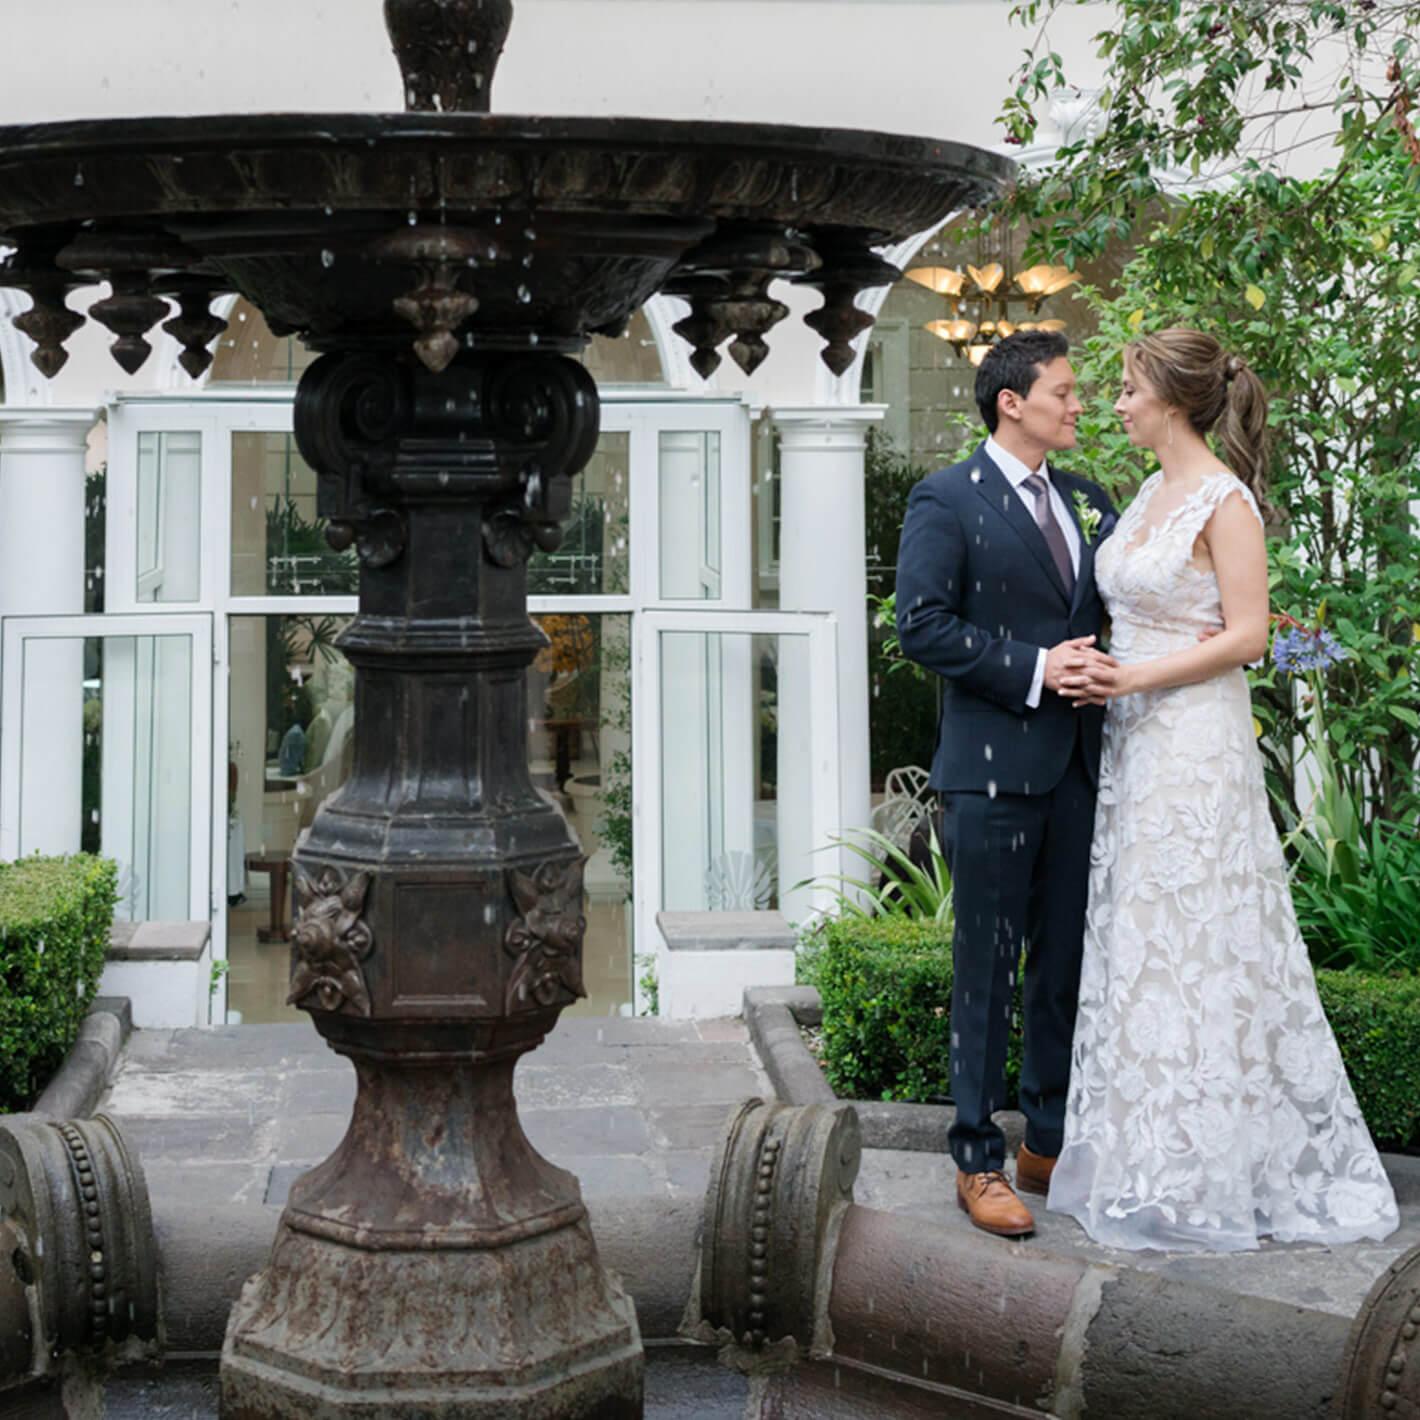 Newlyweds take photos in Casa Gangotena's outdoor courtyard.